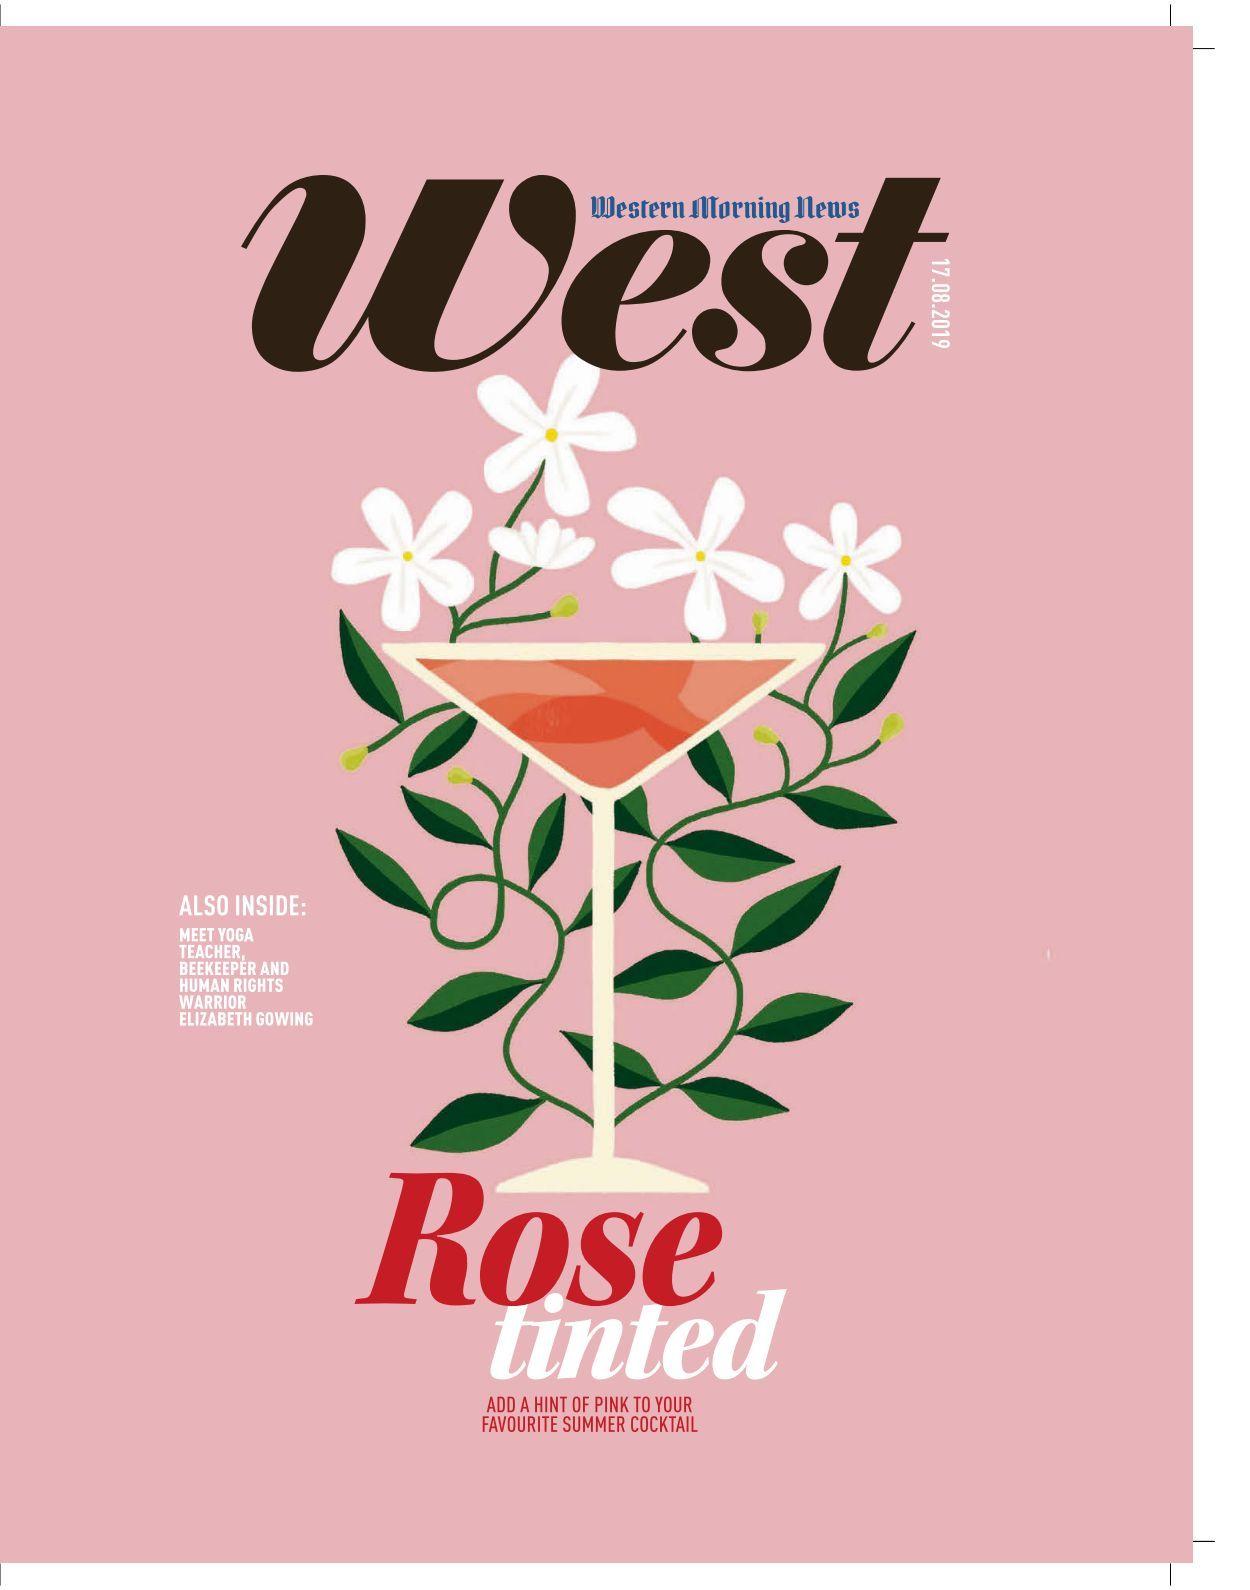 Western Morning News Cornwall   25 25 25